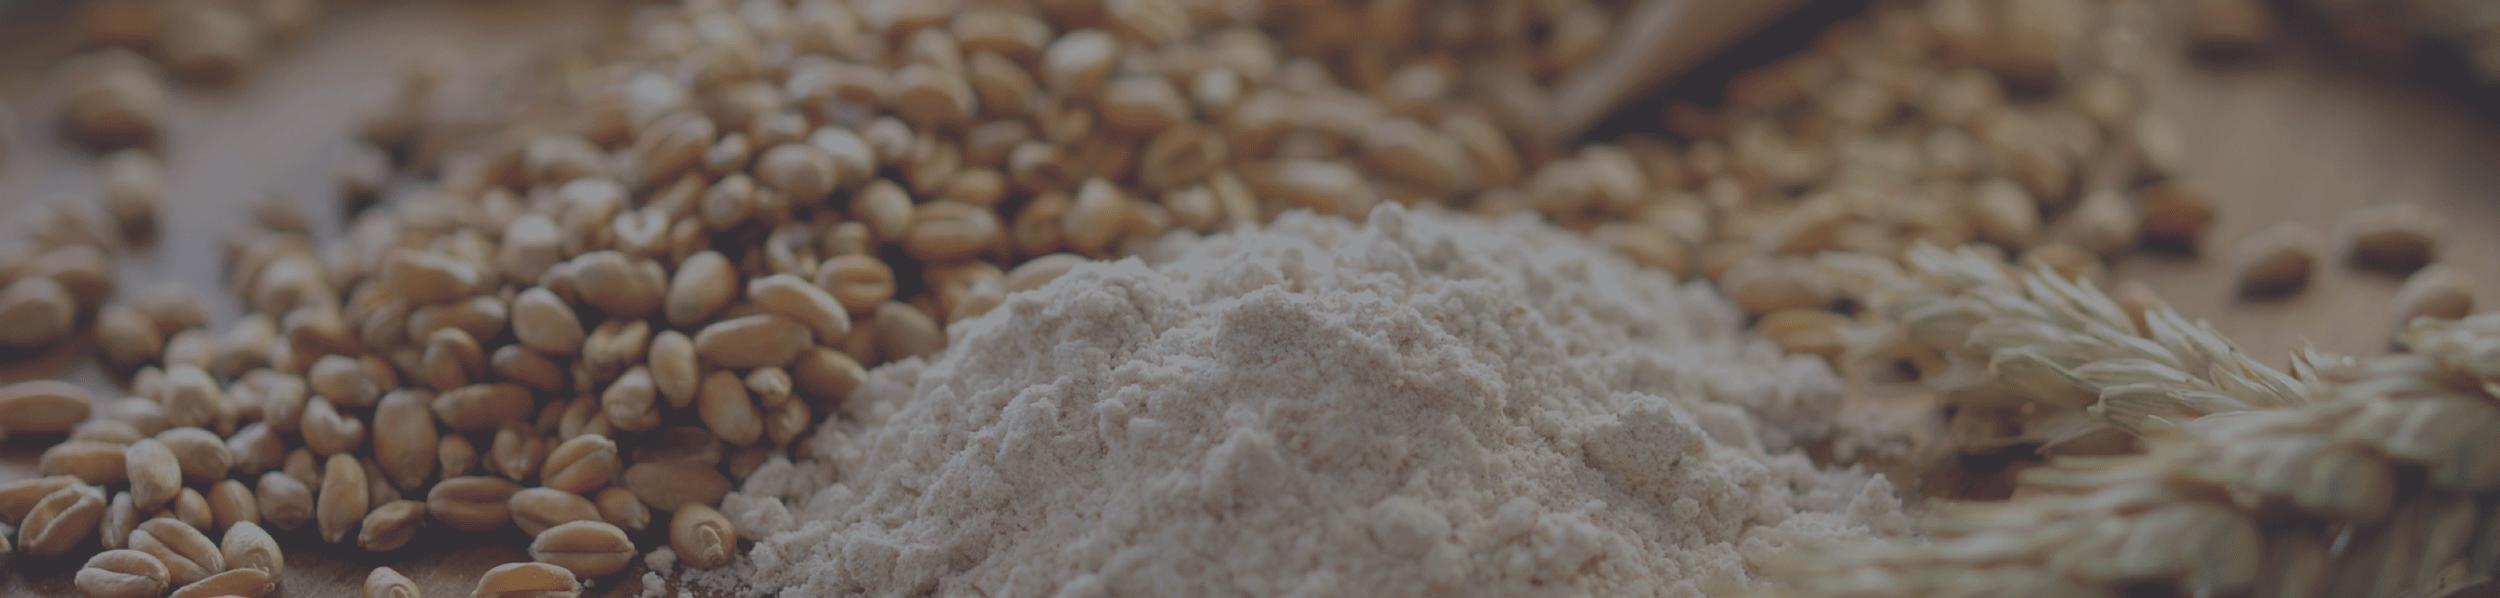 Global grain Index